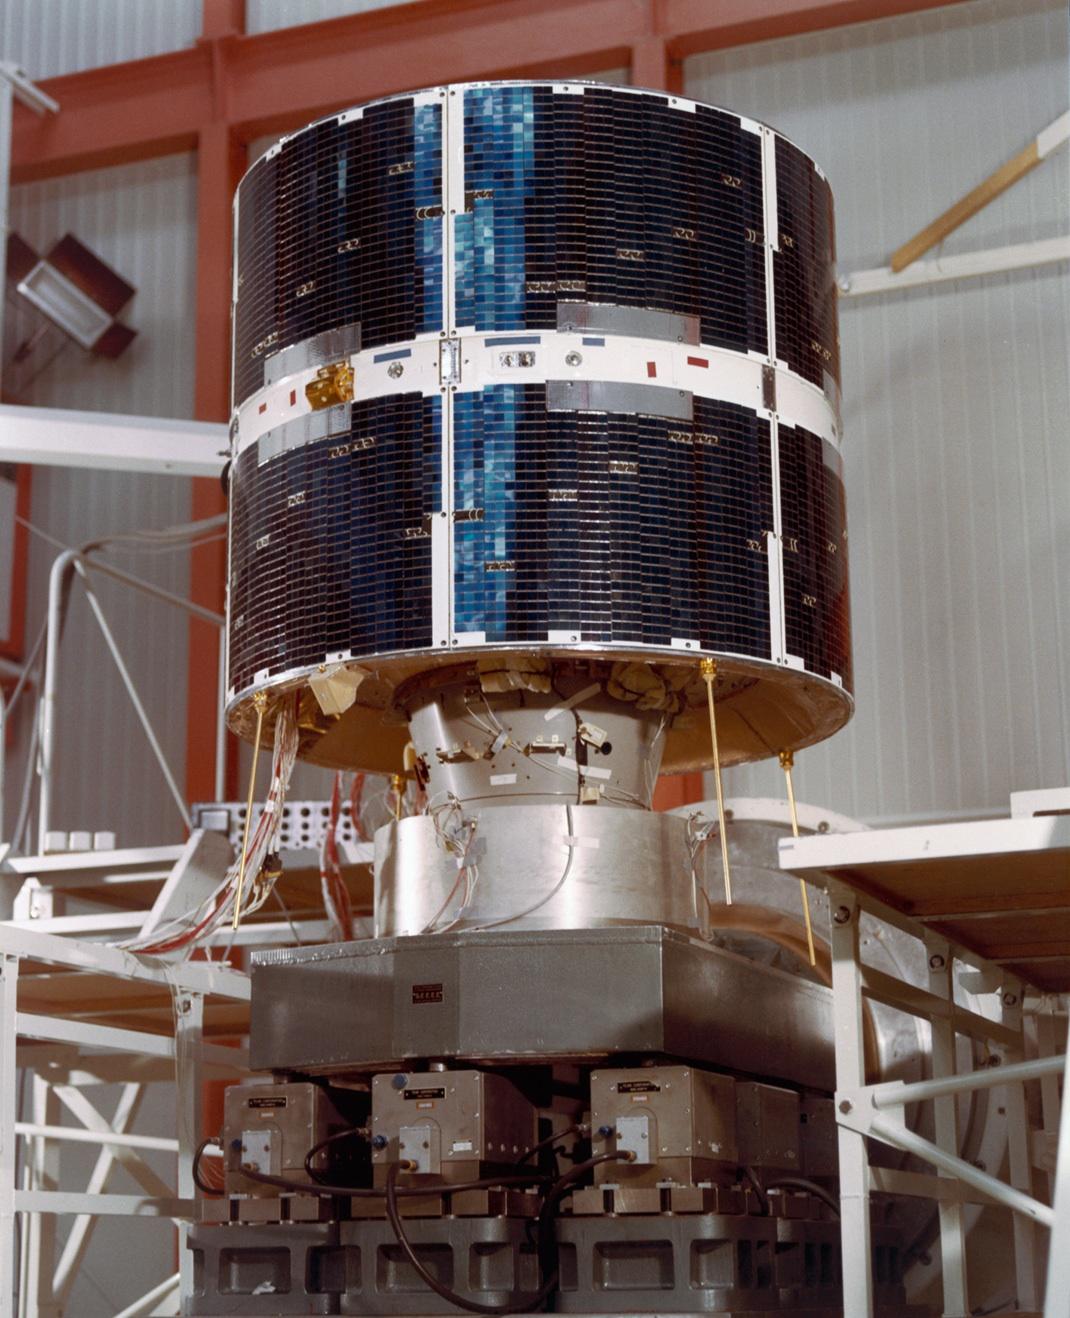 1567215943454-COS-B_1975-1982_Europe_s_pioneer_gamma-ray_observatory.jpg